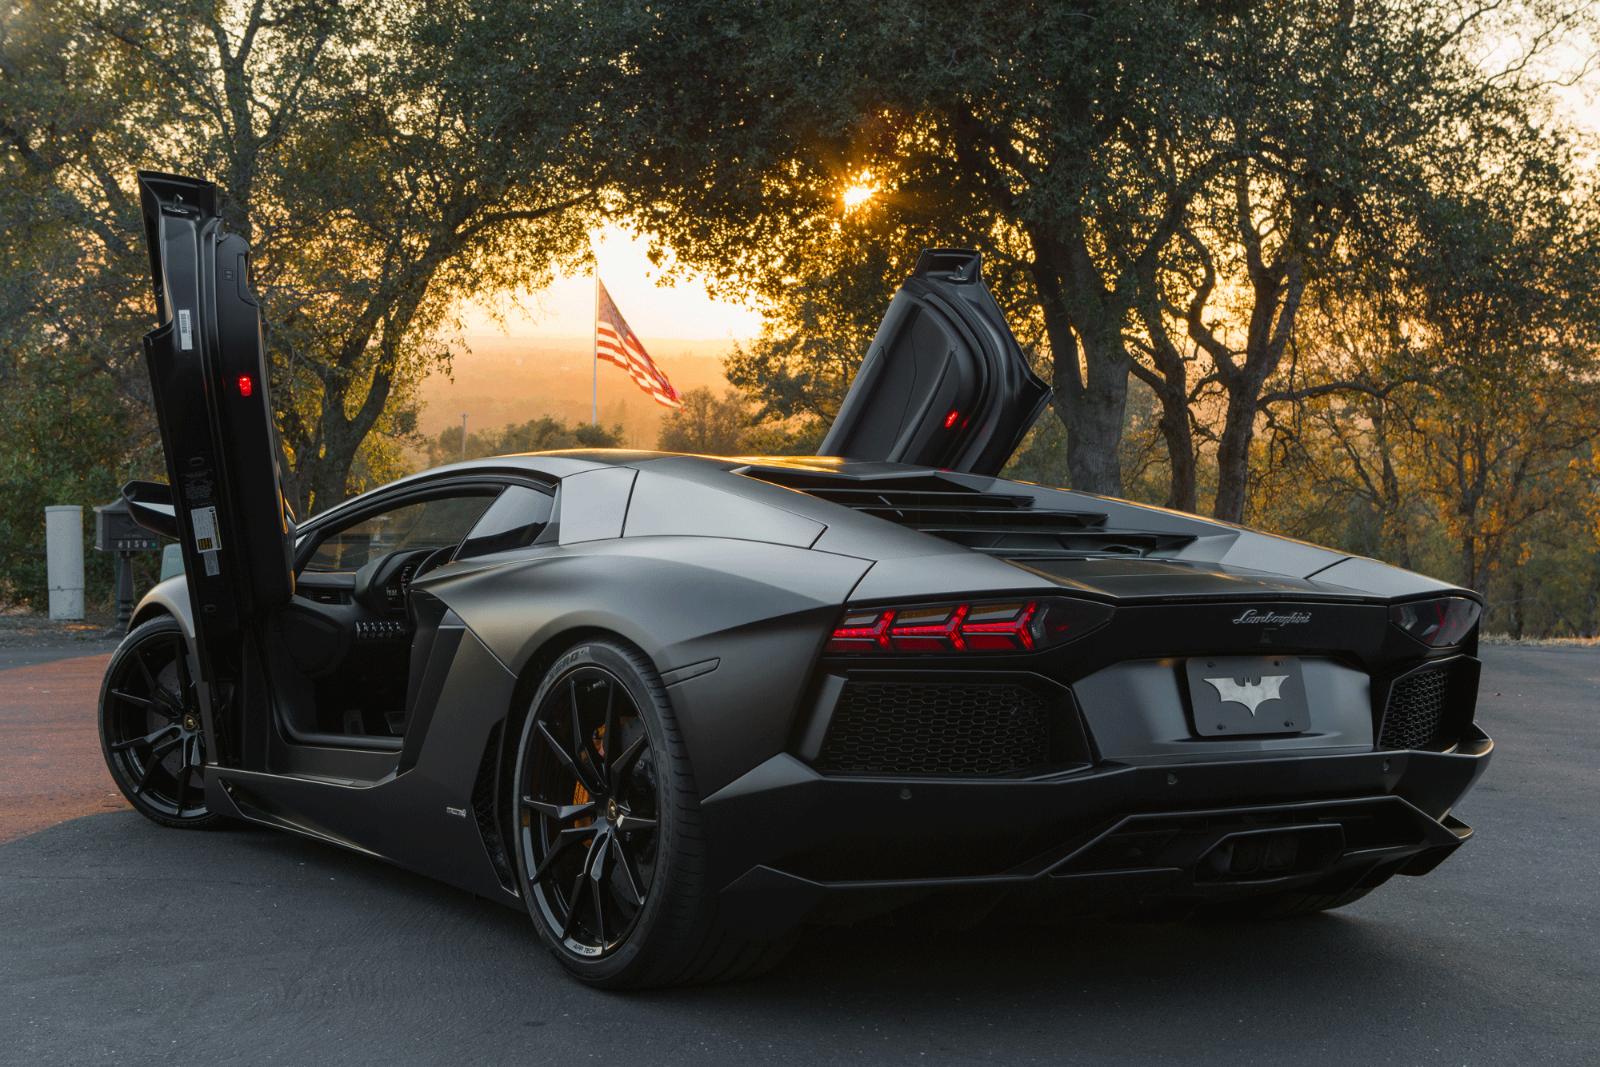 Great 2013 Lamborghini Aventador Lp700 Coupe 2 Door Lamborghini